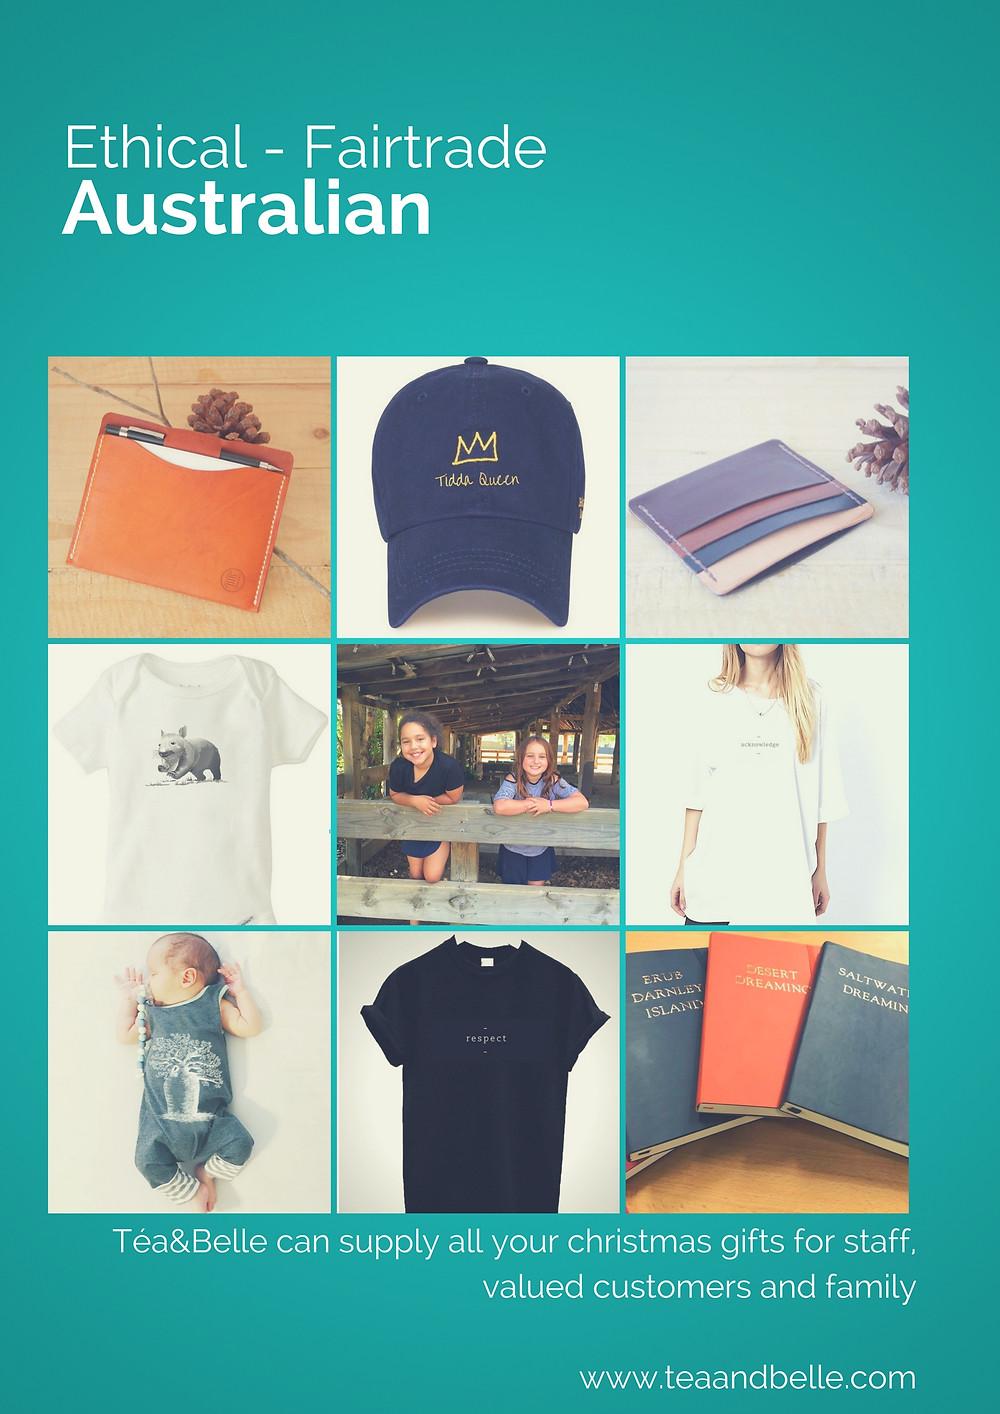 Ethical - Fair-trade - Australian - Indigenous Téa&Belle